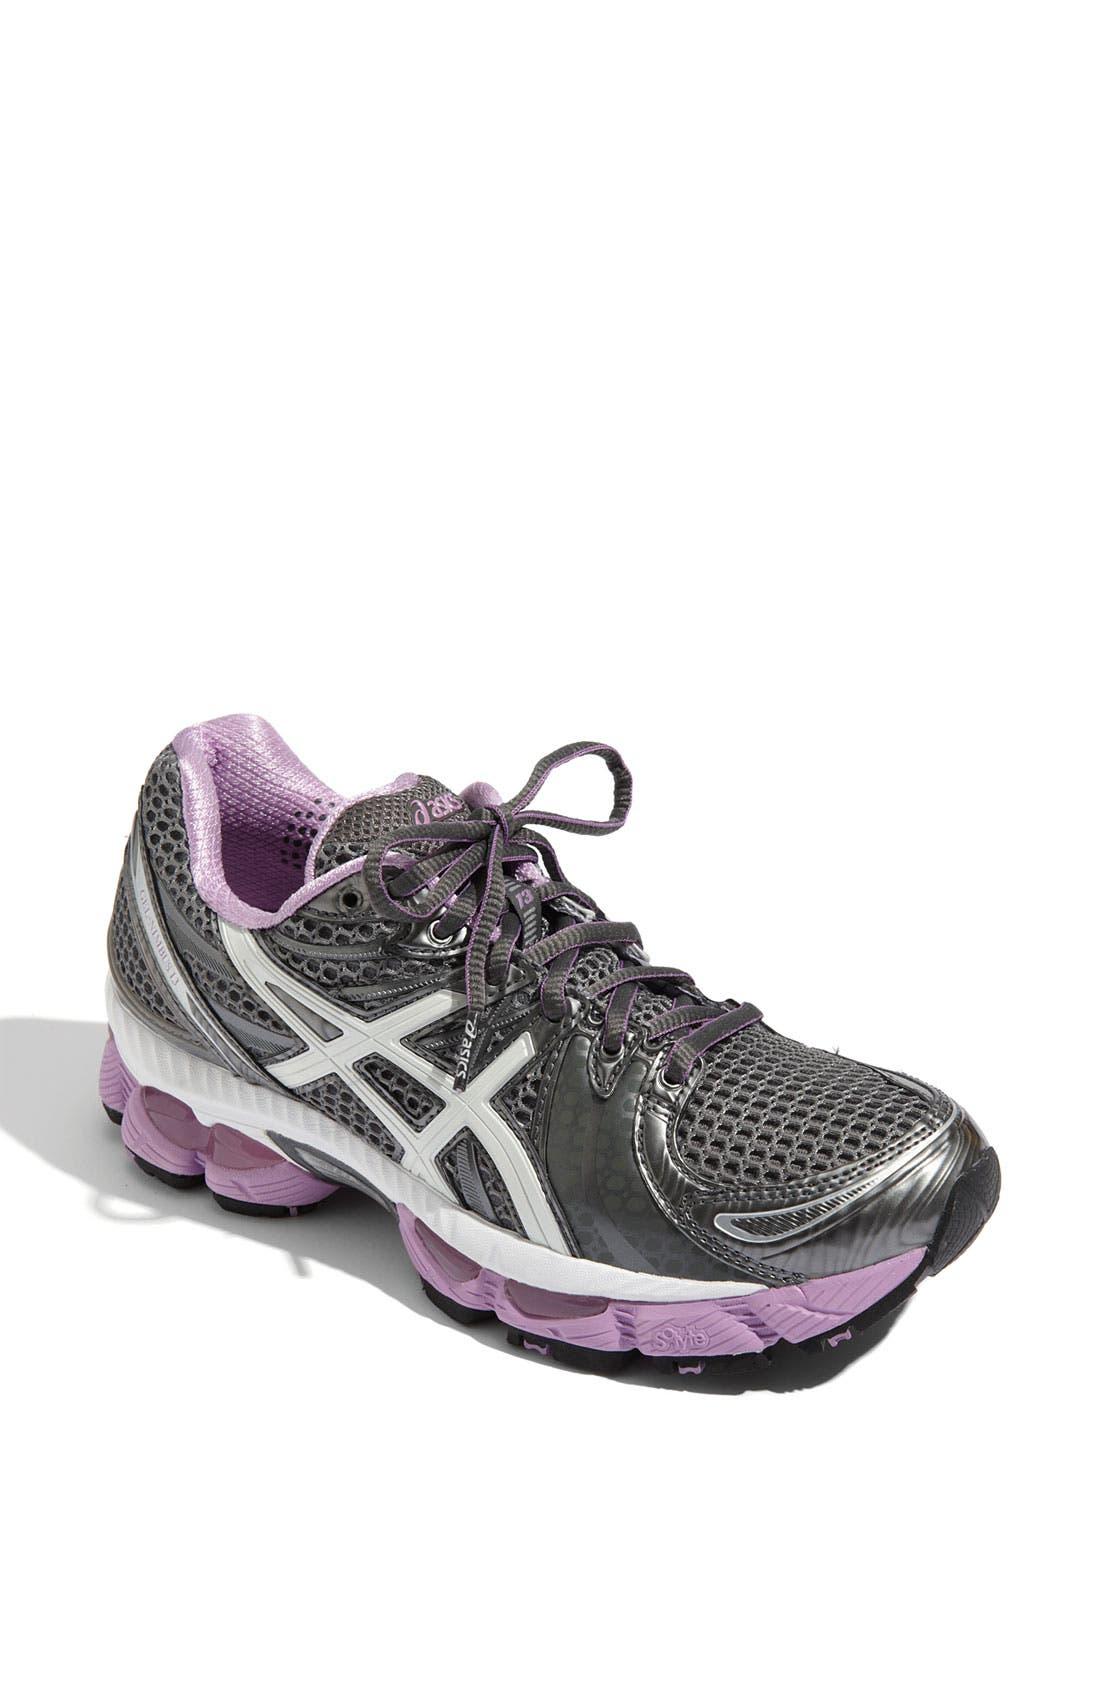 Alternate Image 1 Selected - ASICS® 'GEL-Nimbus® 13' Running Shoe (Women)